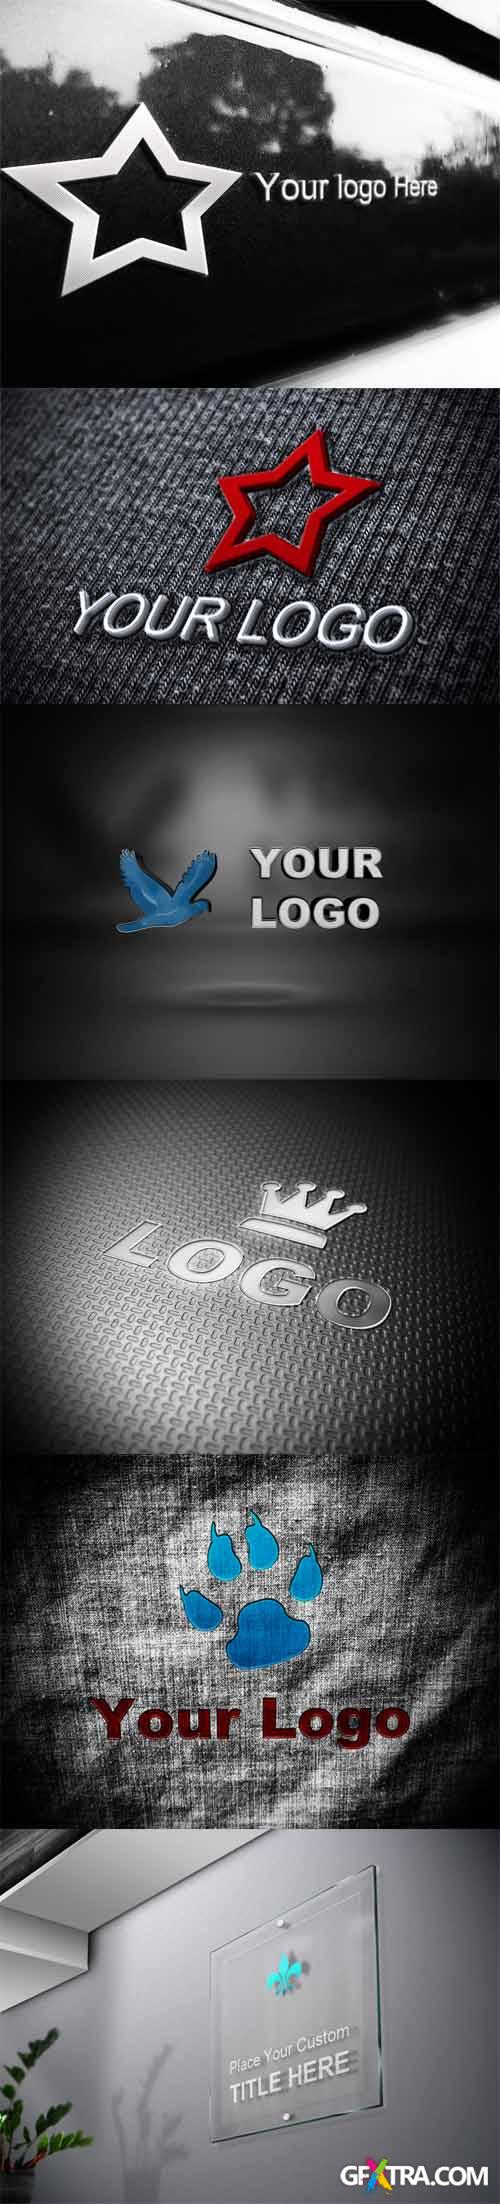 6 Logo Mock-ups PSD